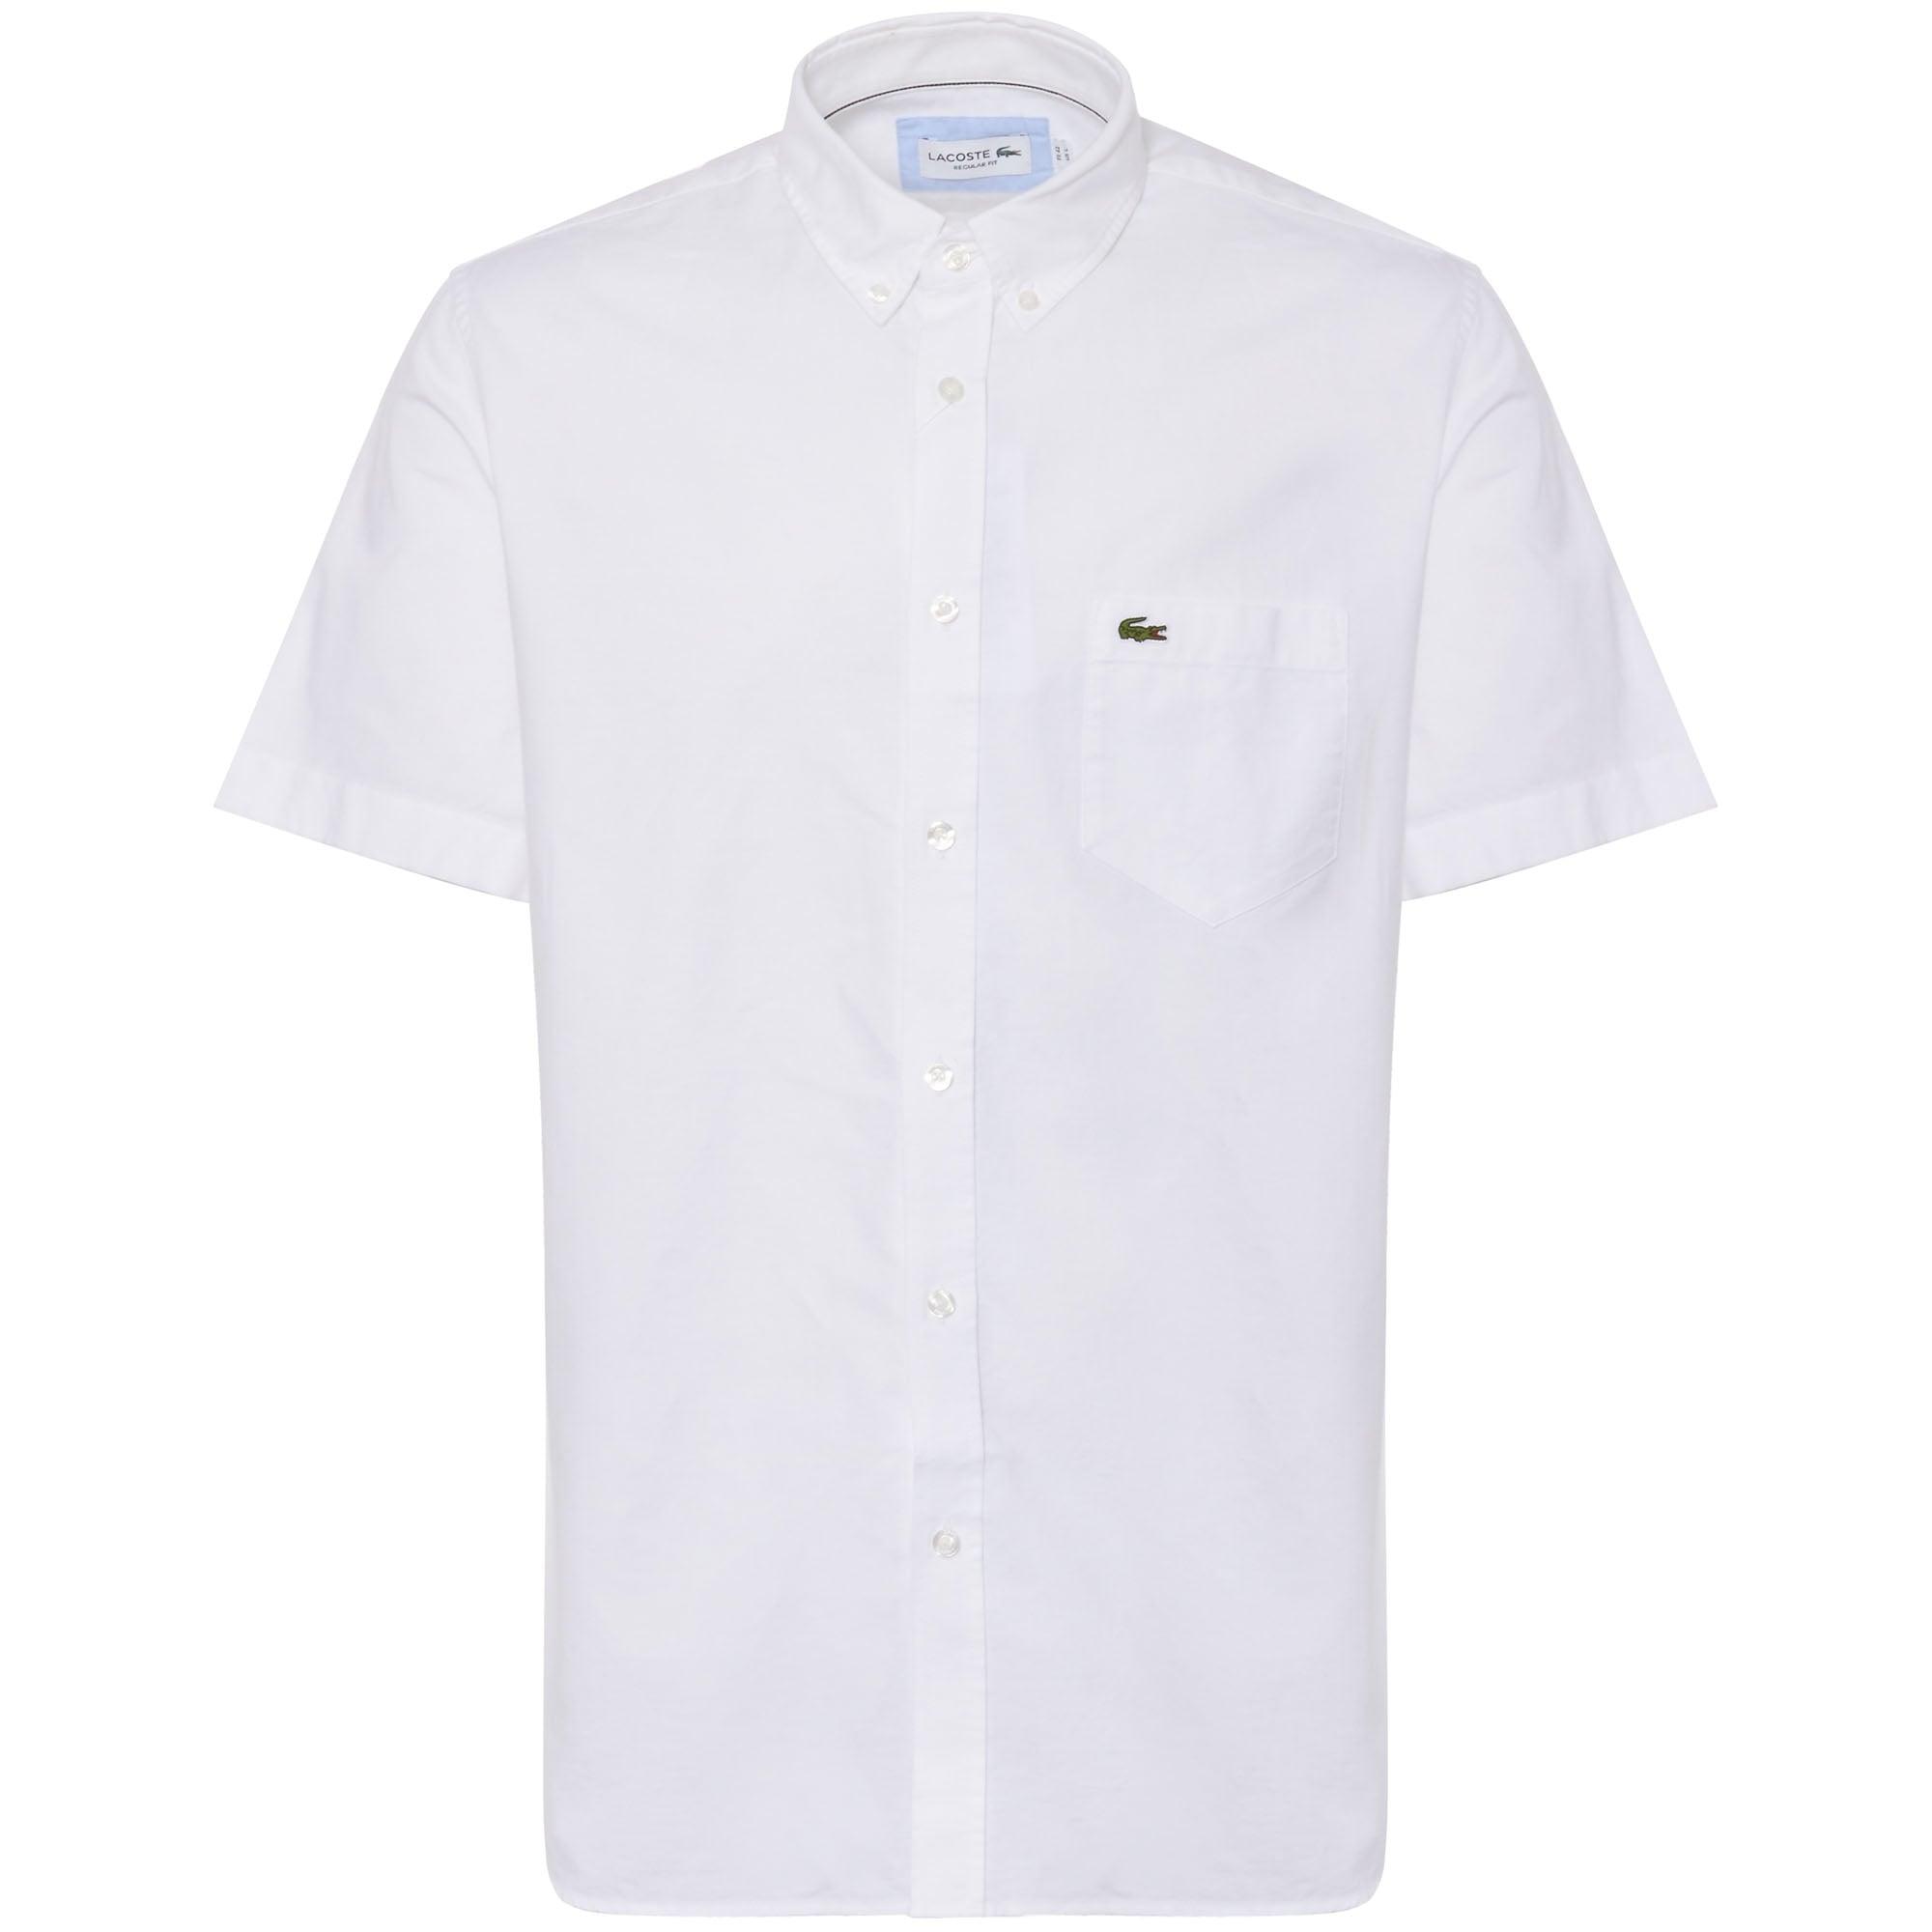 White Short Sleeve Oxford Shirt